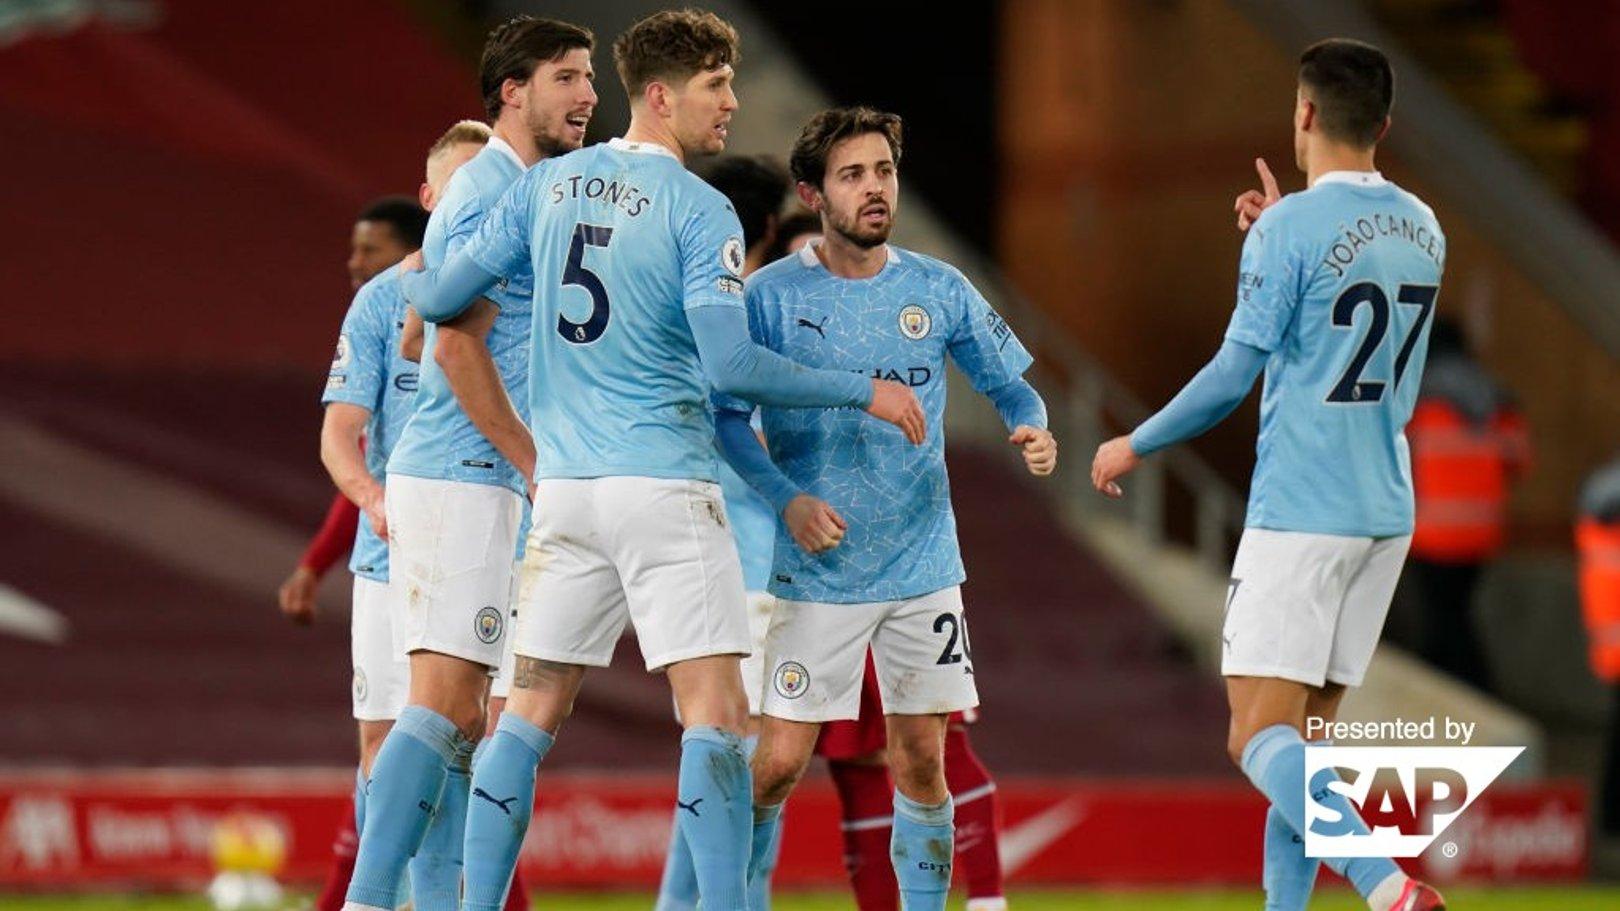 Estatísticas: Defesa do City na Premier League